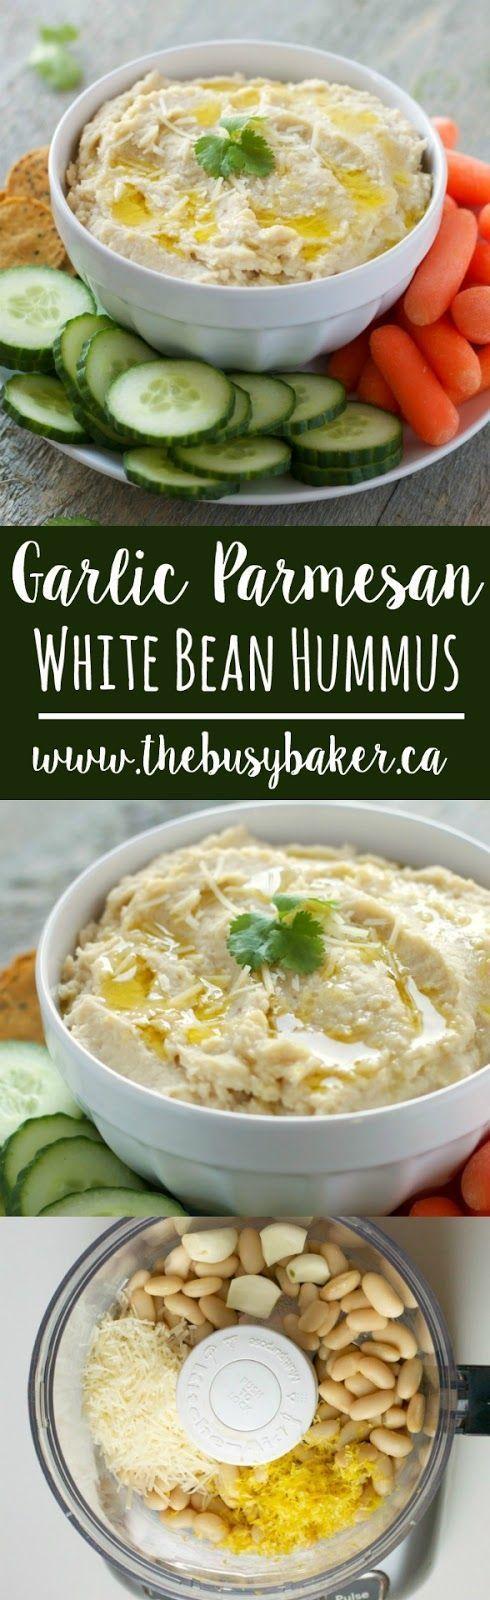 Garlic Parmesan White Bean Hummus recipe from http://thebusybaker.ca!